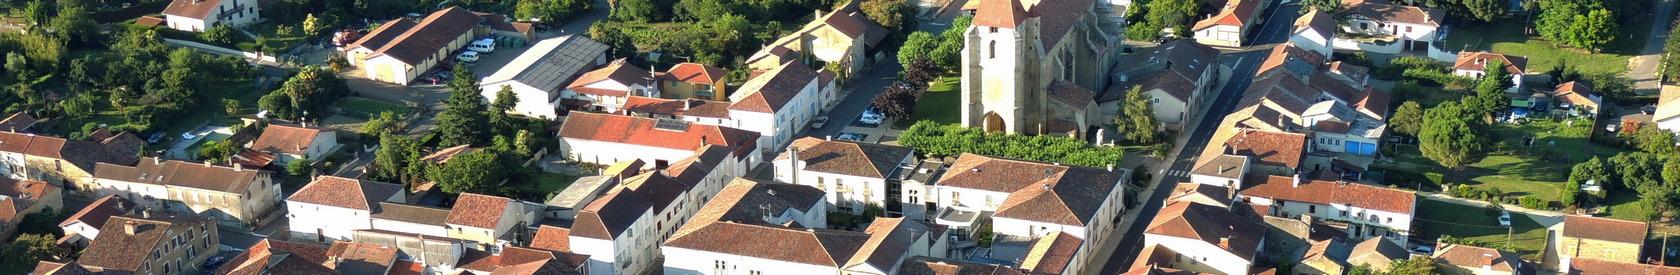 Forum médiéval 23/24 juin 2018 à Geaune en Tursan (40)